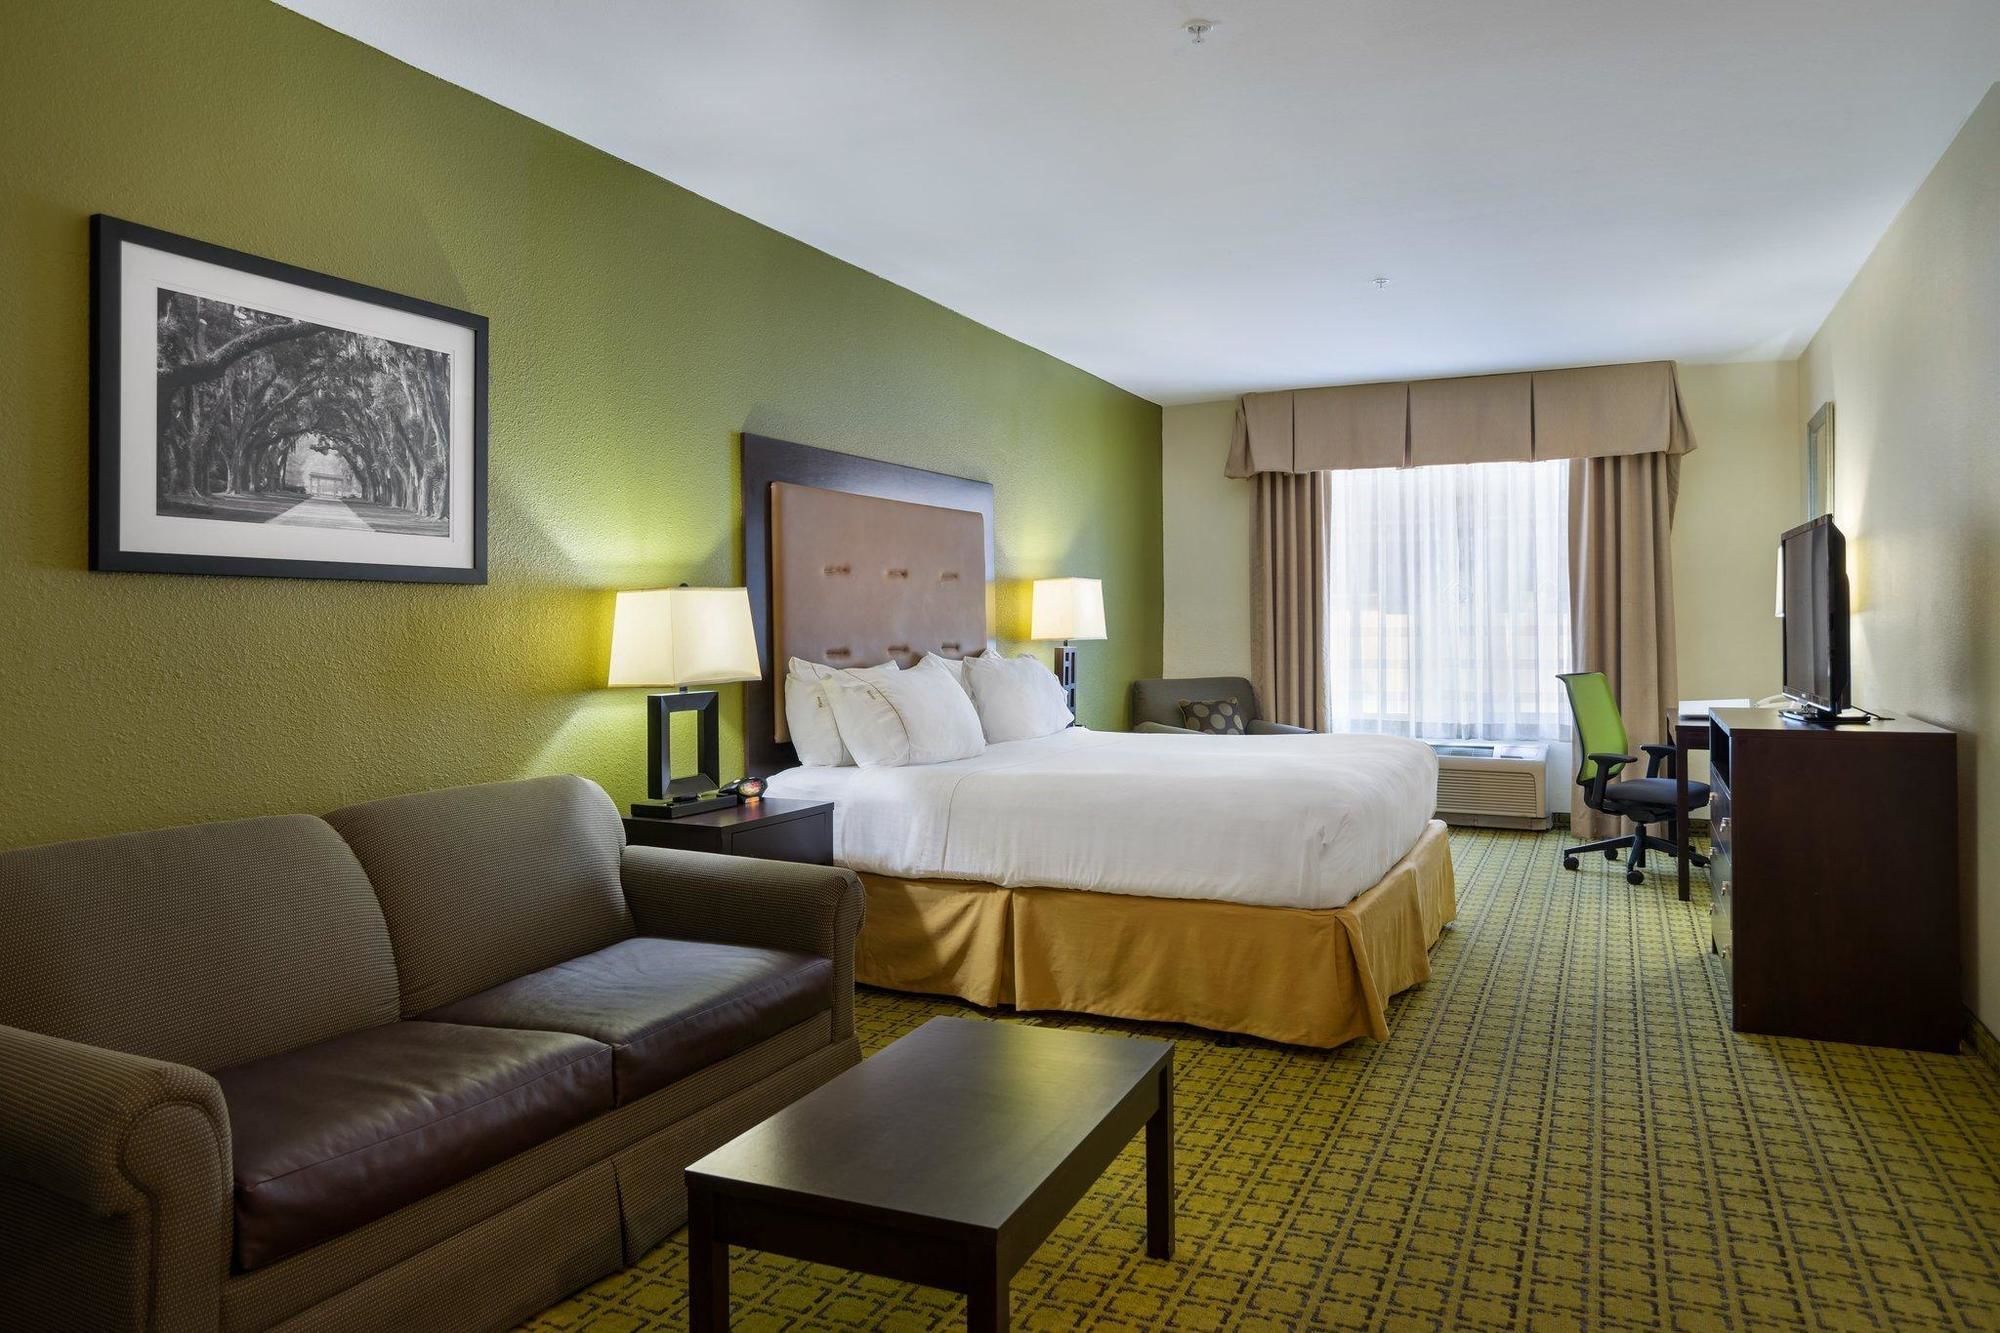 Holiday Inn Express and Suites Savannah - Midtown in Savannah, GA